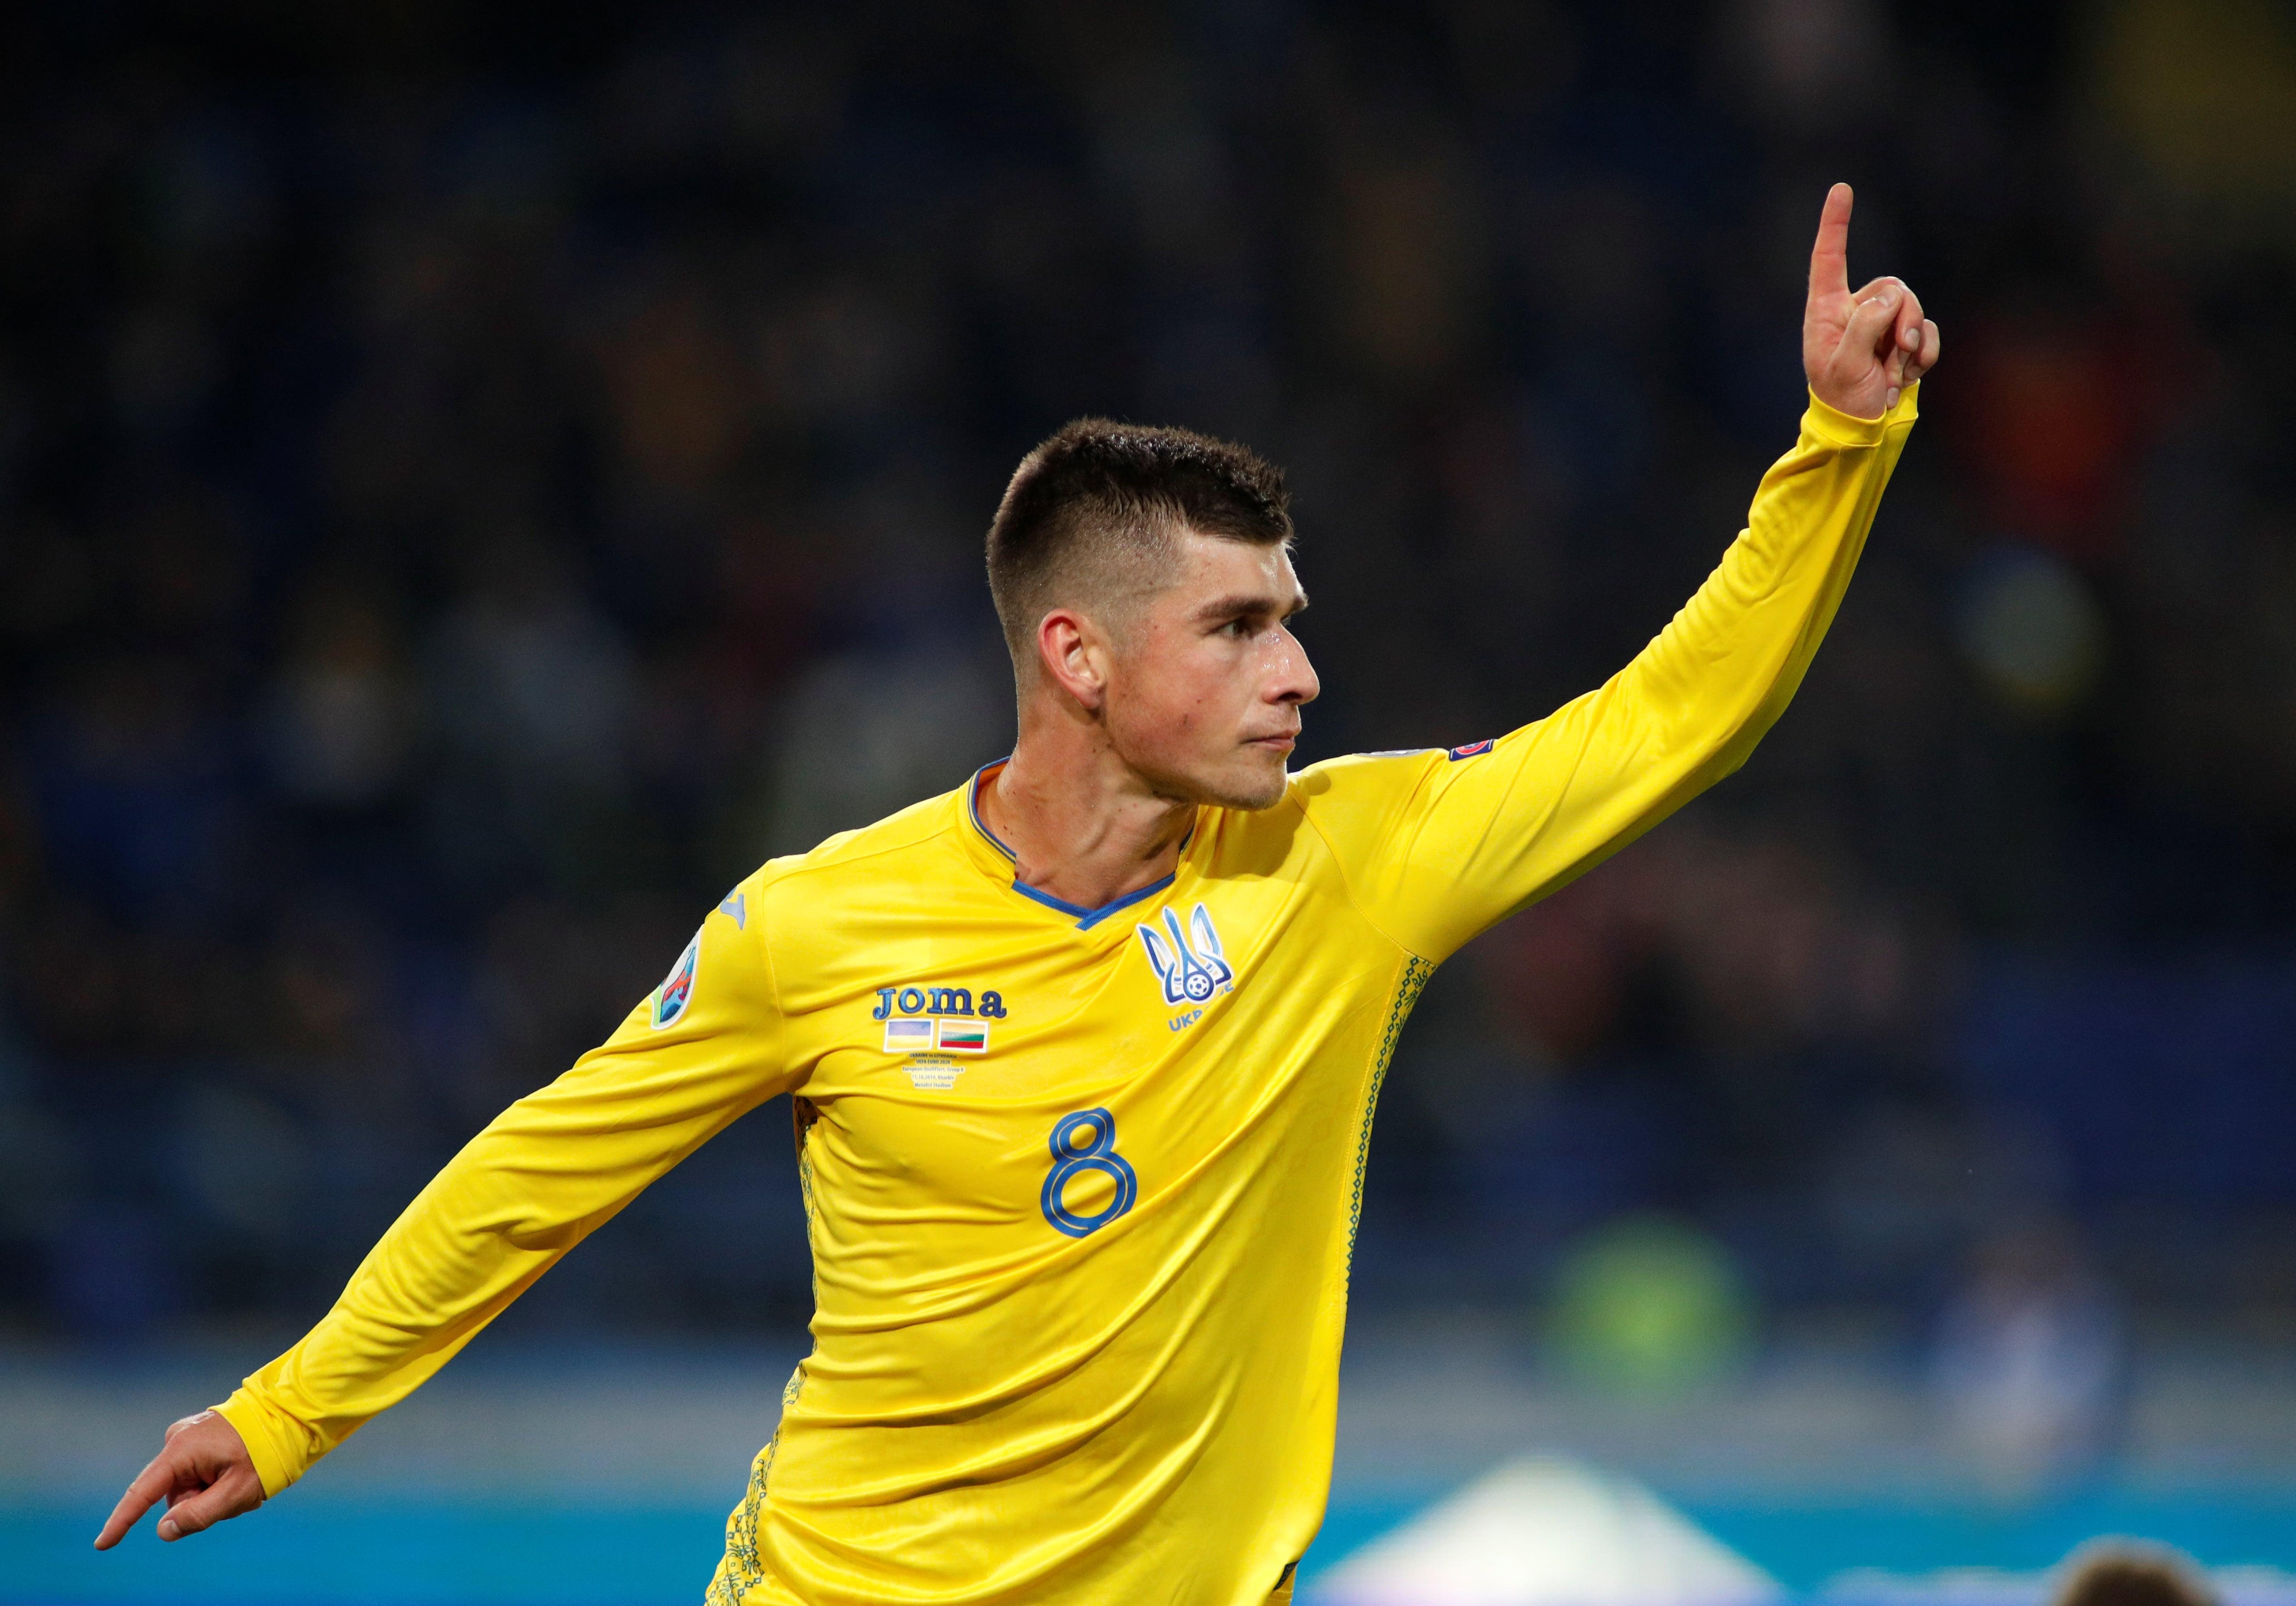 Chelsea to make summer move for impressive Atalanta star Ruslan Malinovskyi